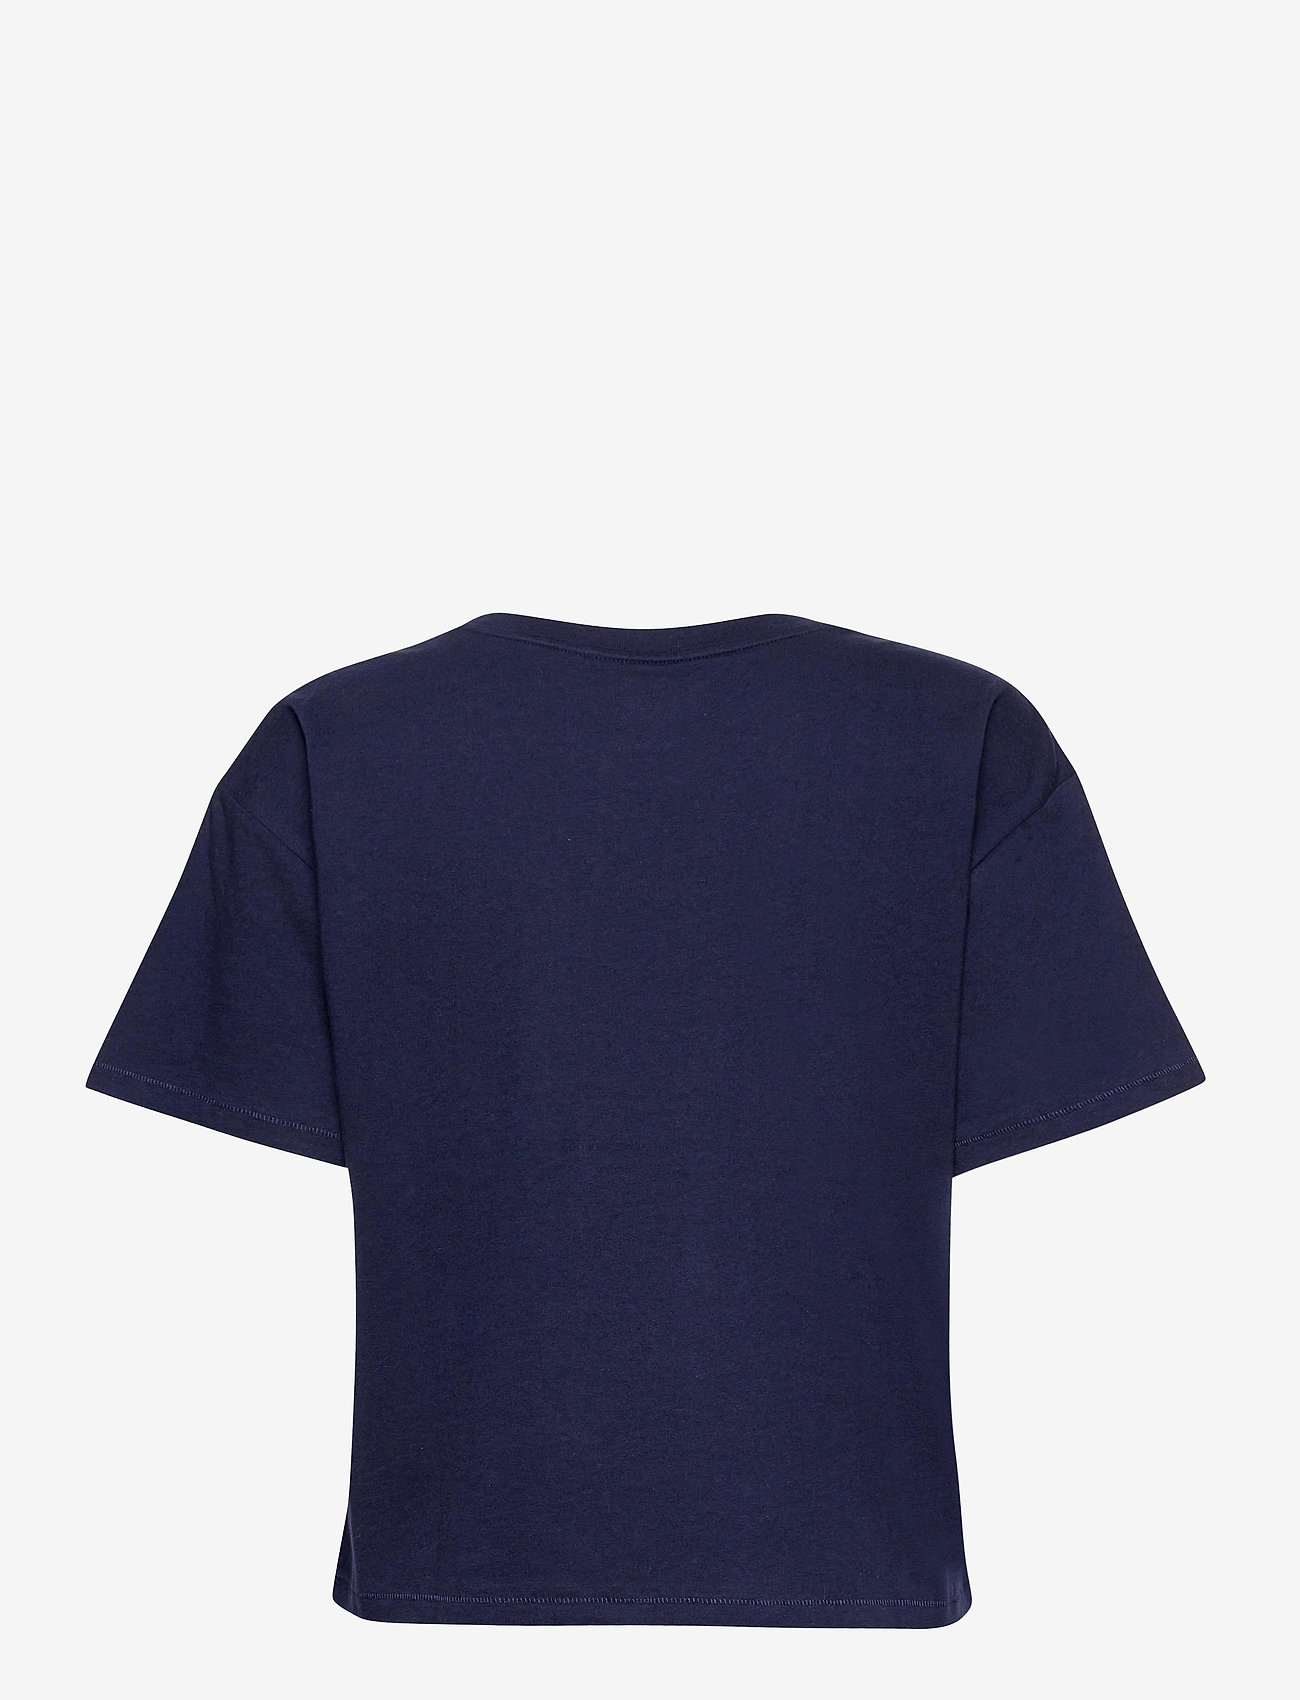 GAP - GAP EASY SS TEE - t-shirts - navy uniform - 1